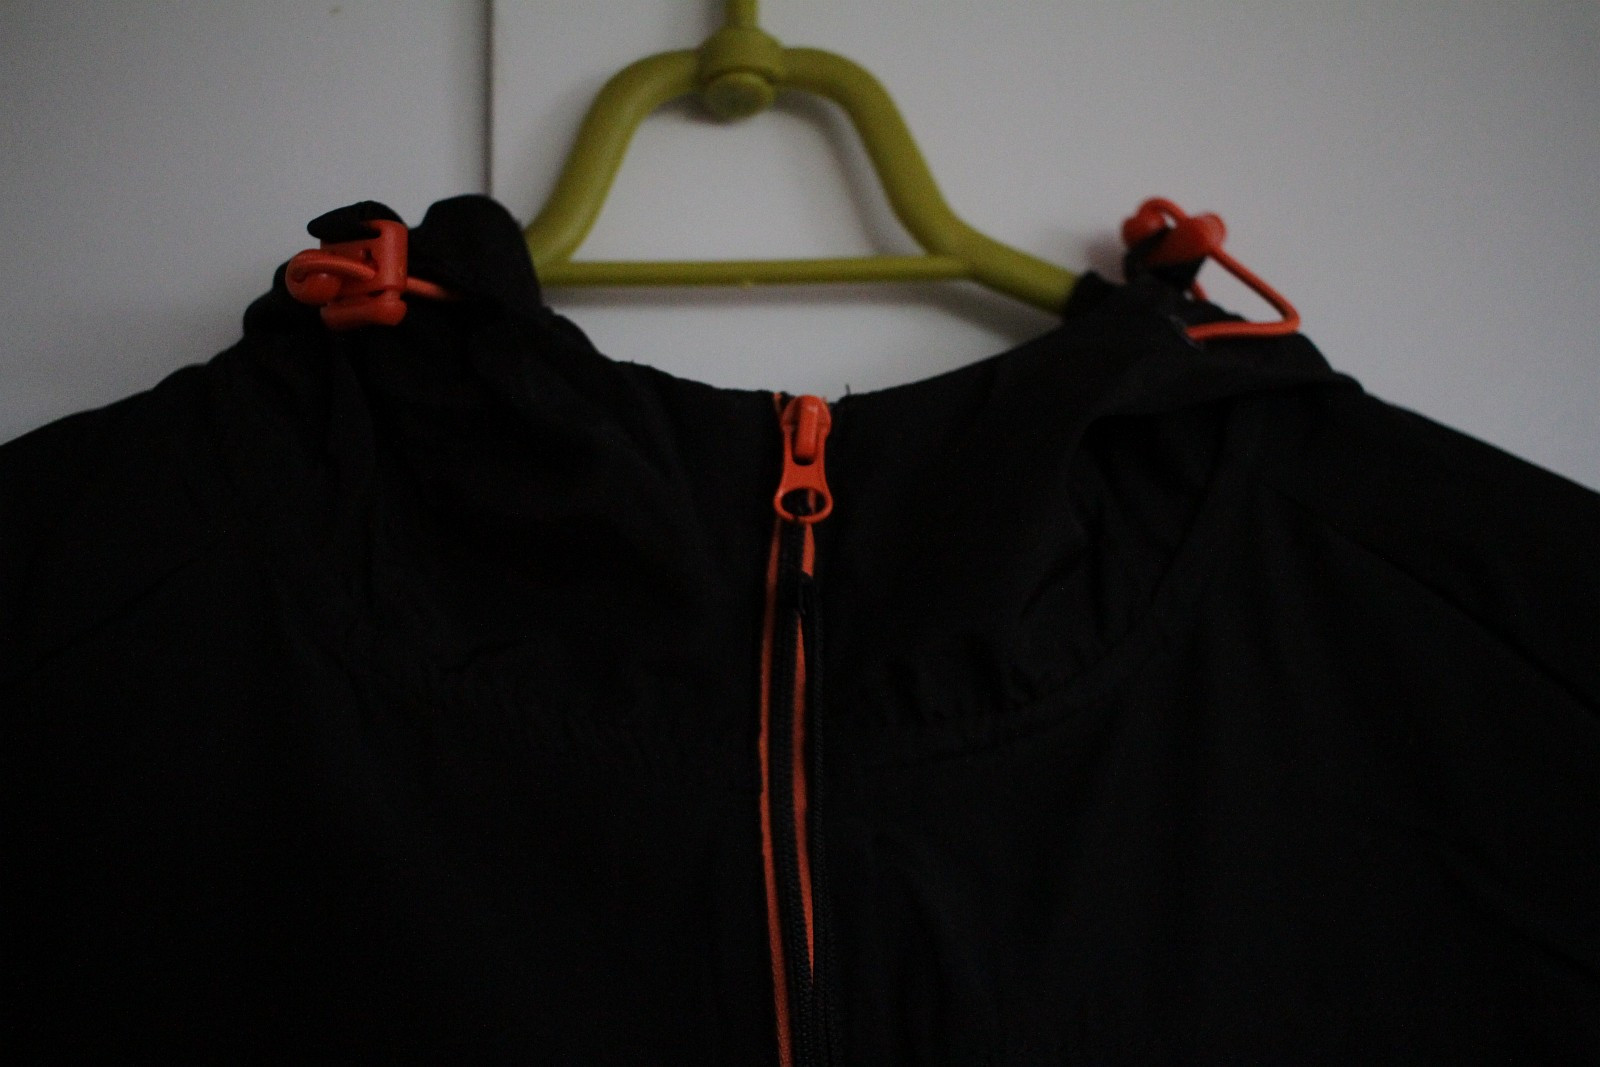 sort svart jakke XS 34 vind sport jogging running løping